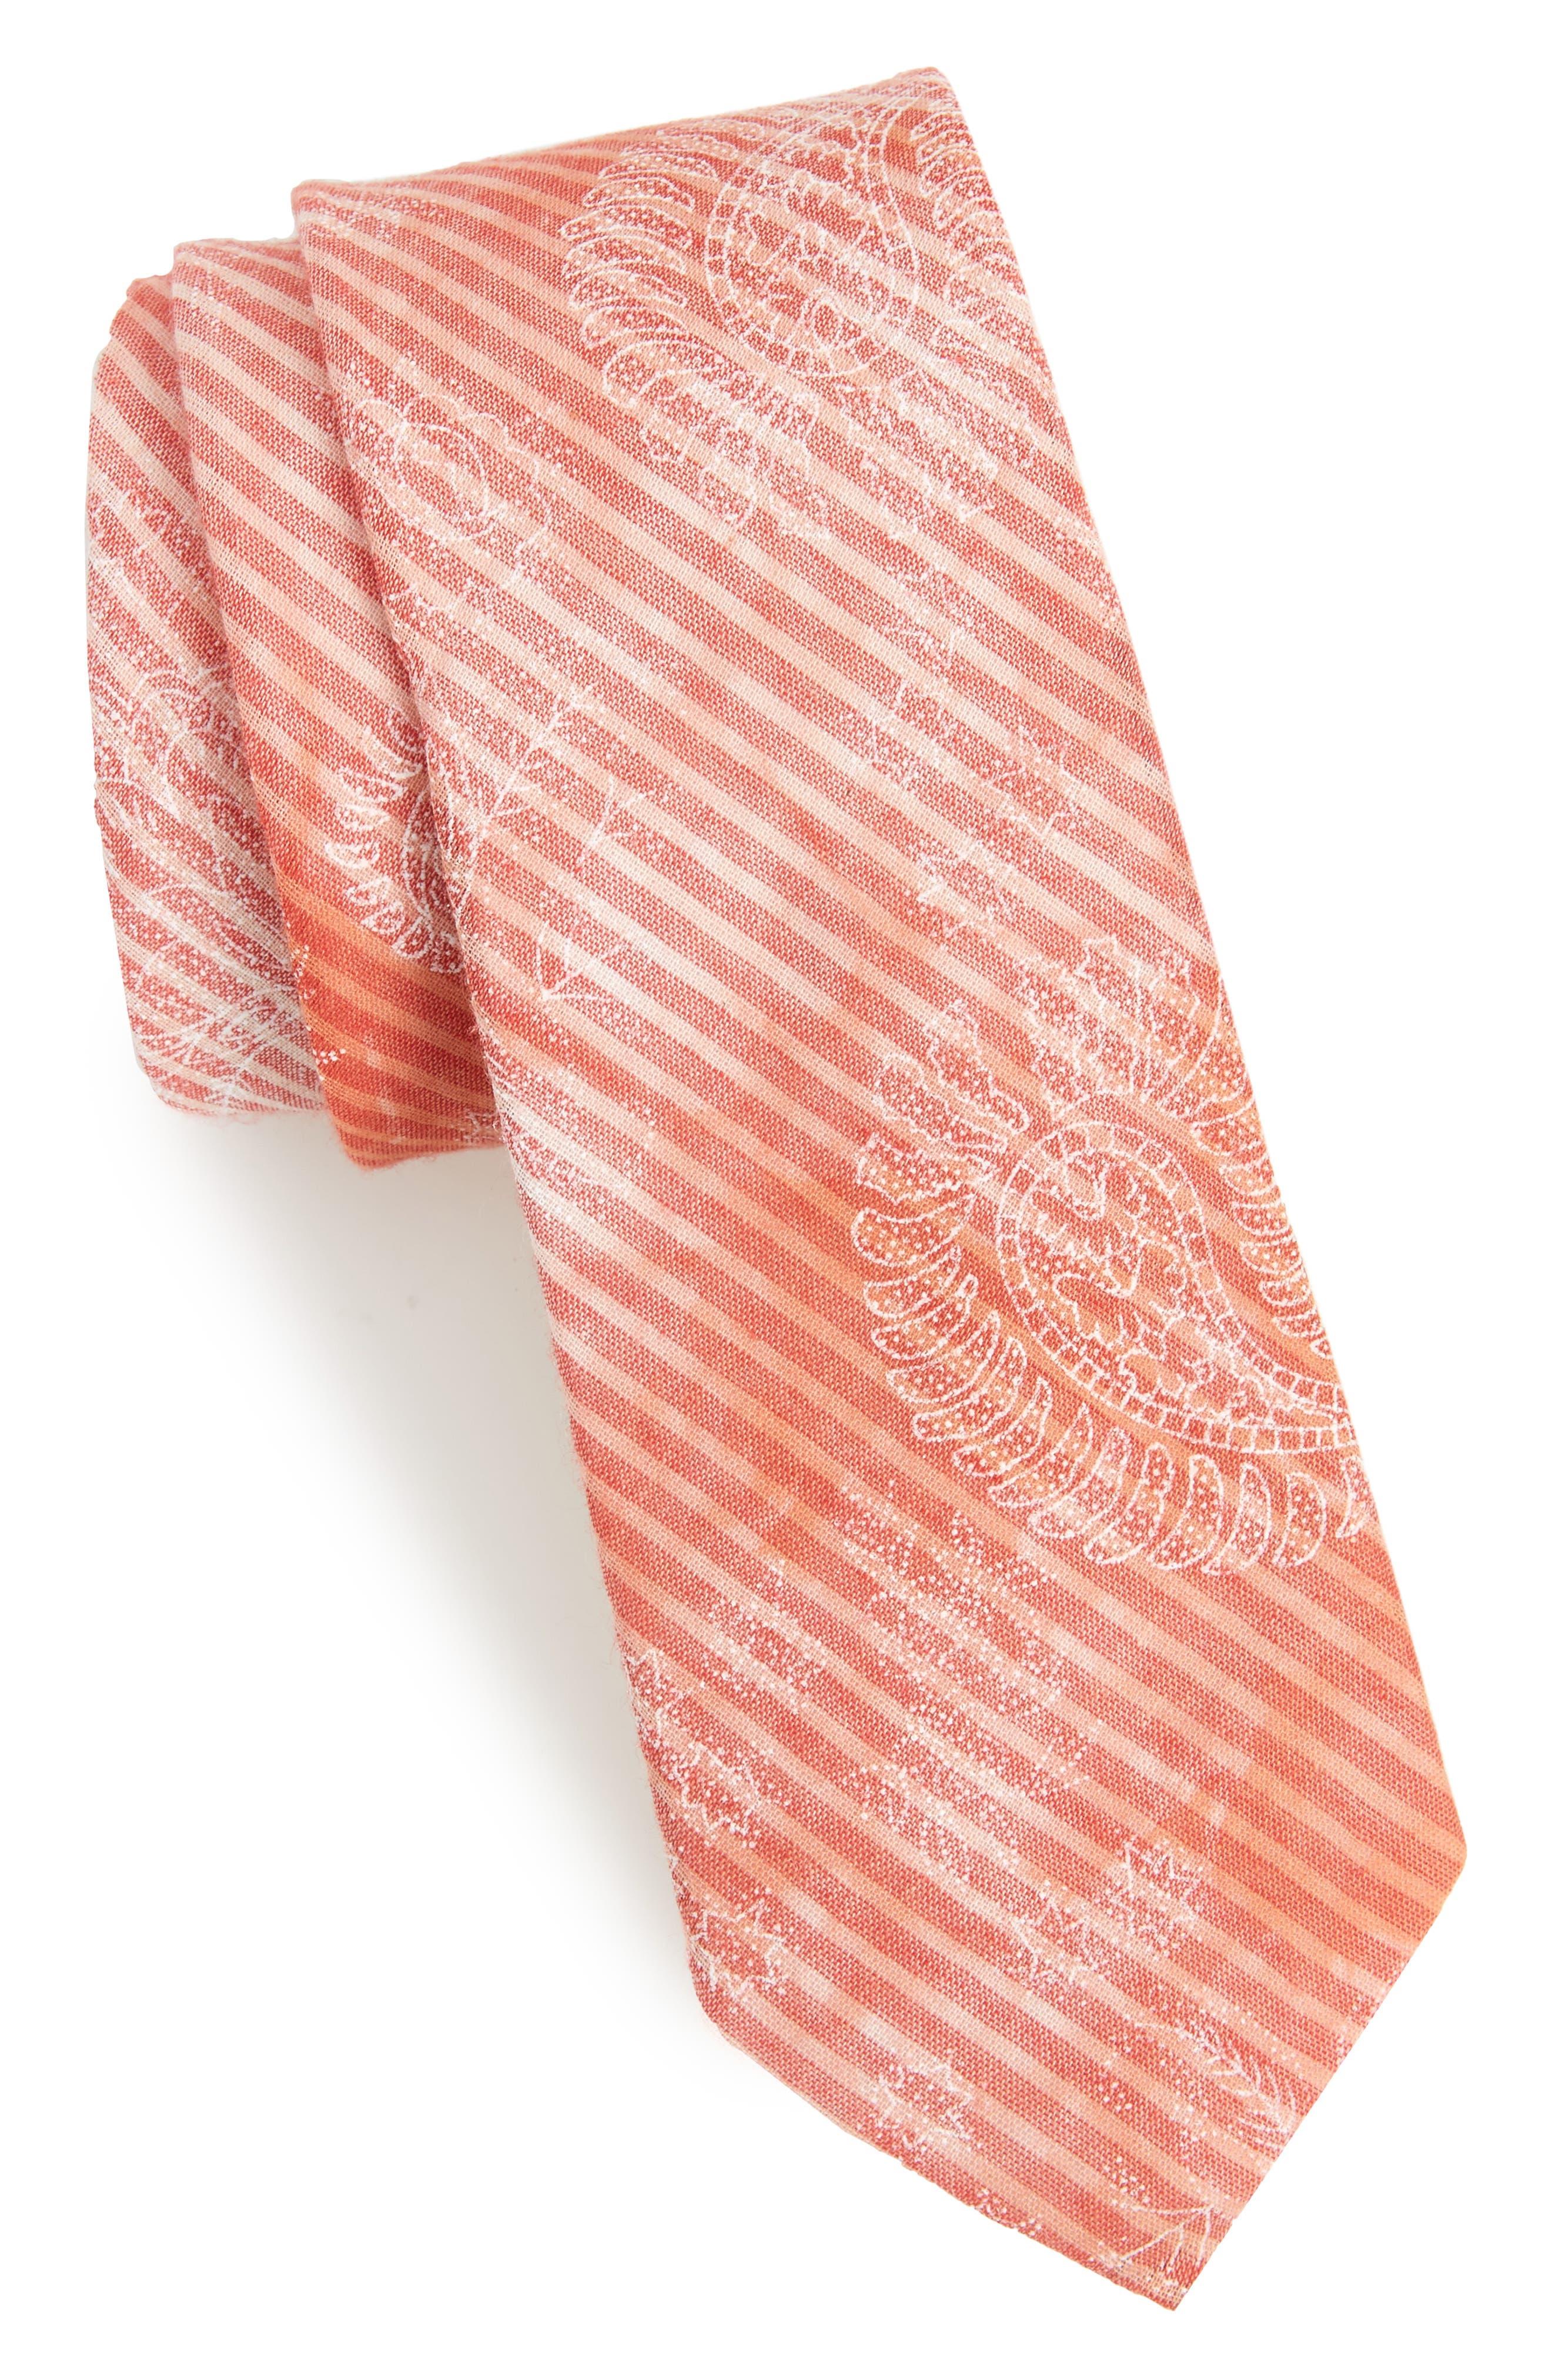 Lee Paisley Cotton Tie,                             Main thumbnail 1, color,                             Pink